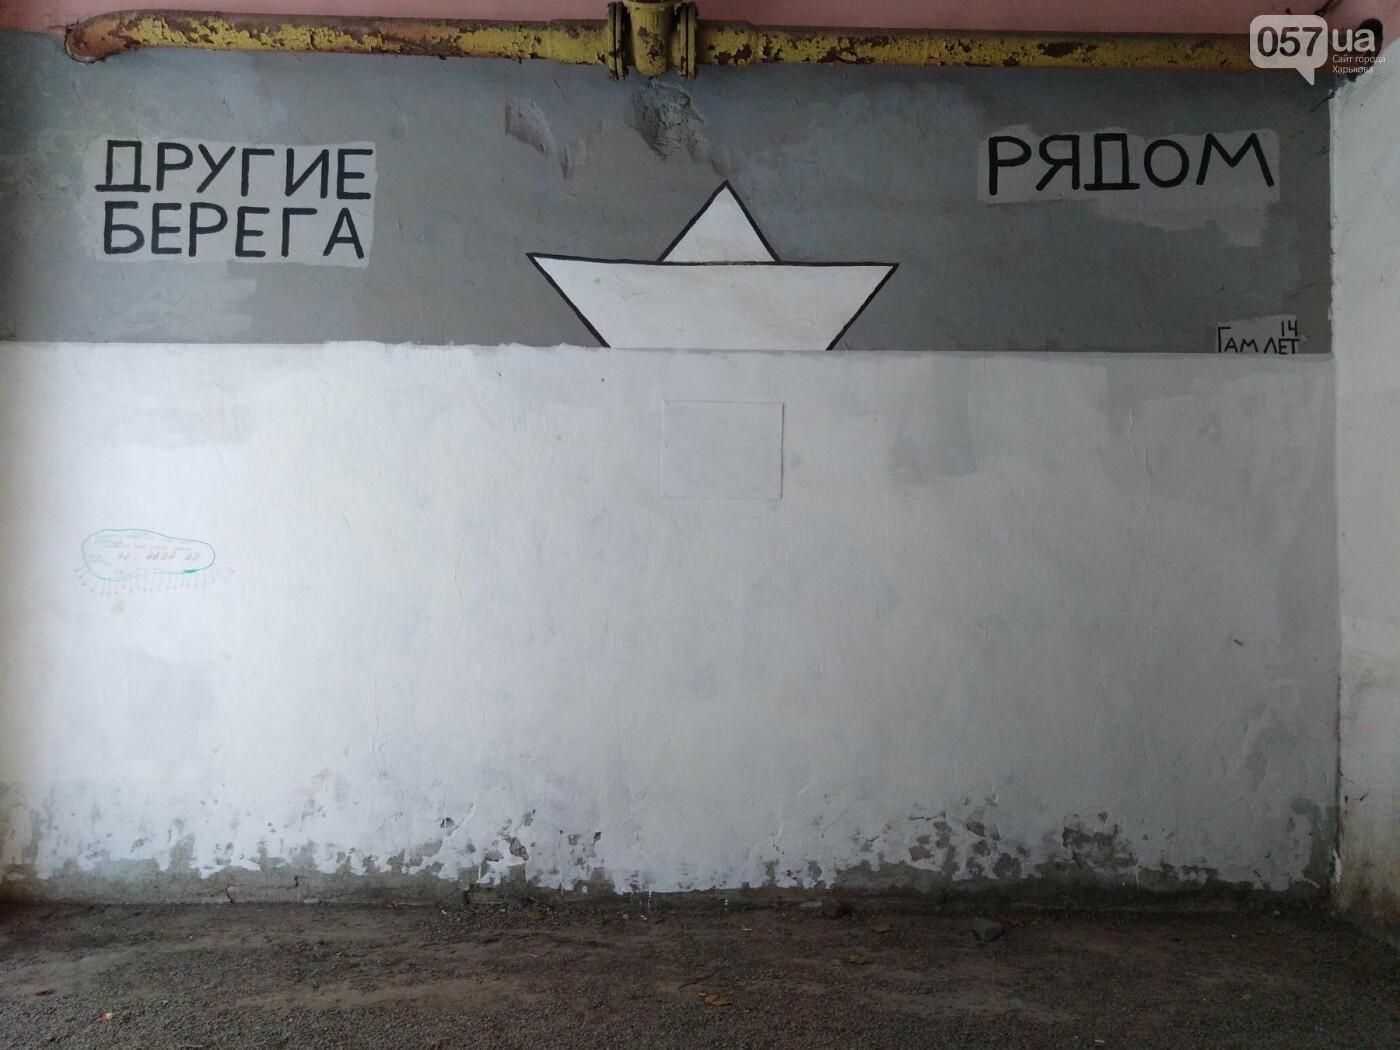 Стрит-арт Гамлета в Харькове: ТОП-10 граффити художника, - ФОТО, фото-28